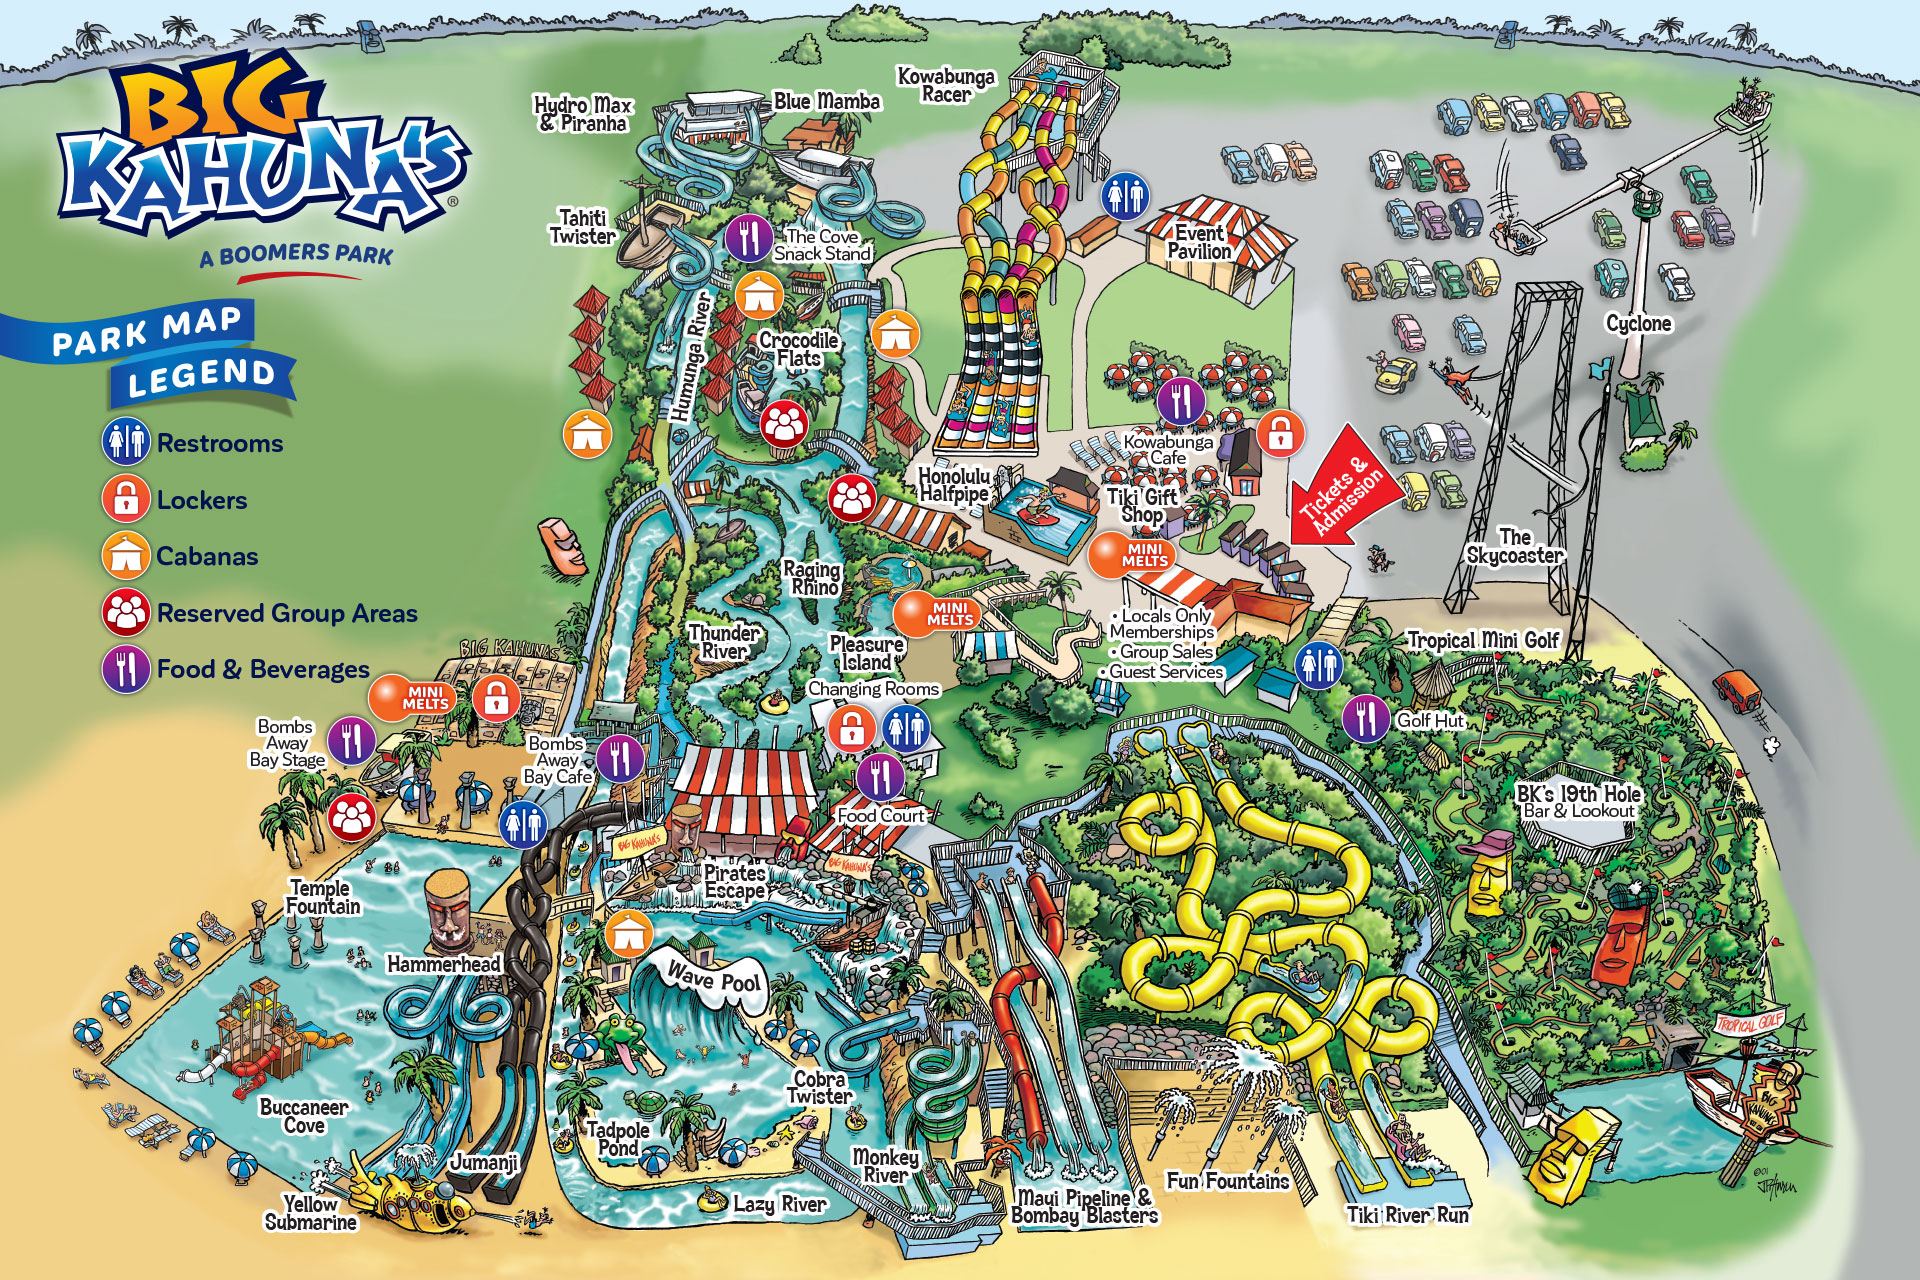 Big Kahunas Park Map